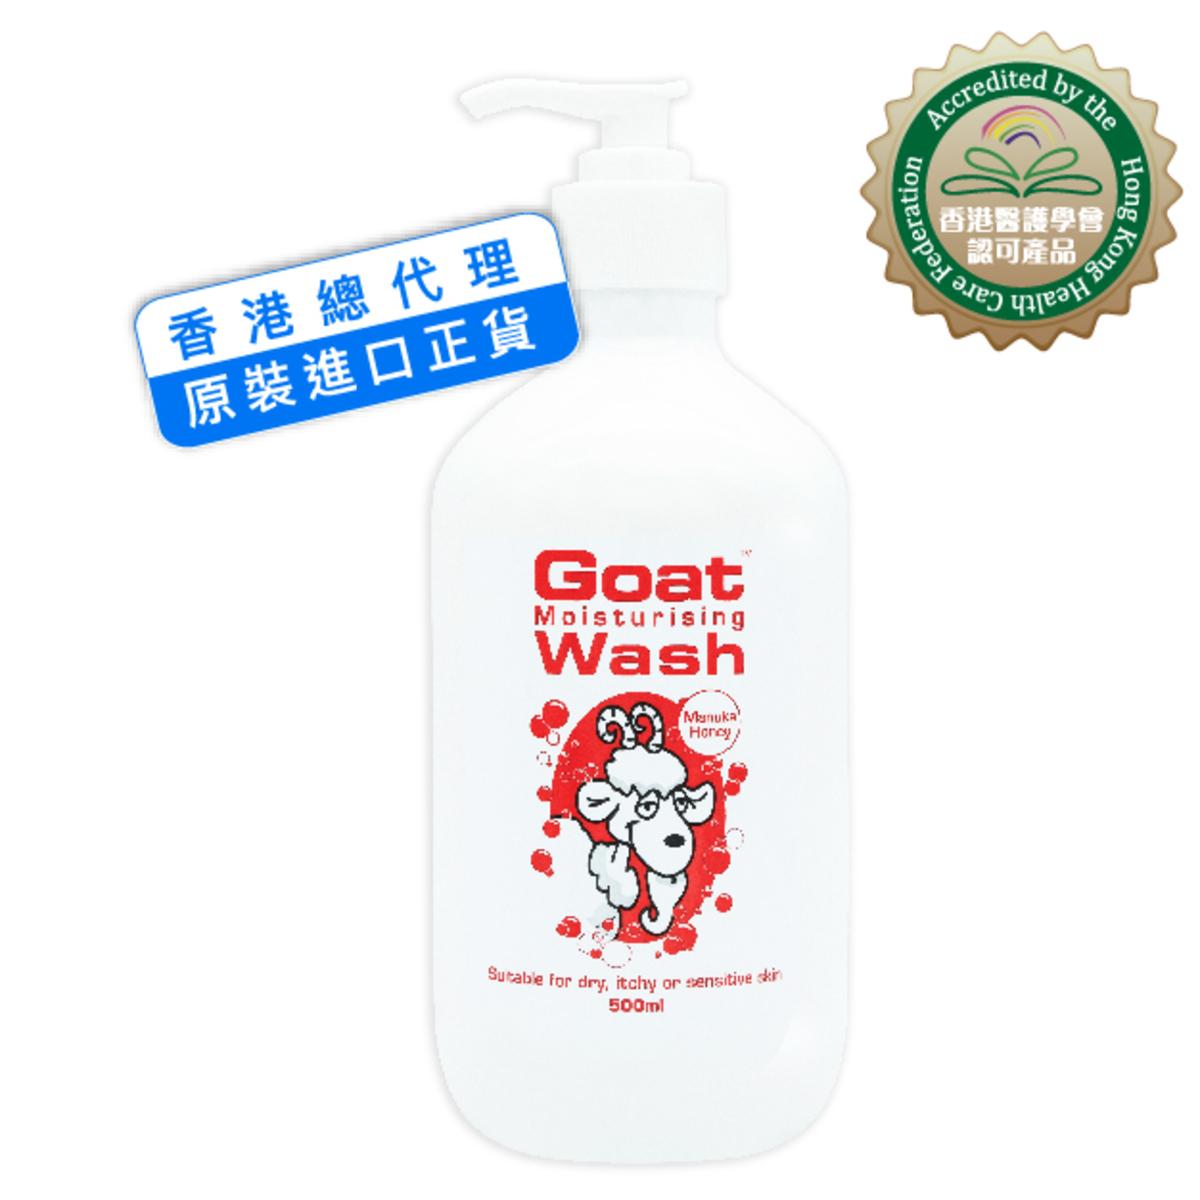 Goat Moisturising Wash (Manuka Honey)